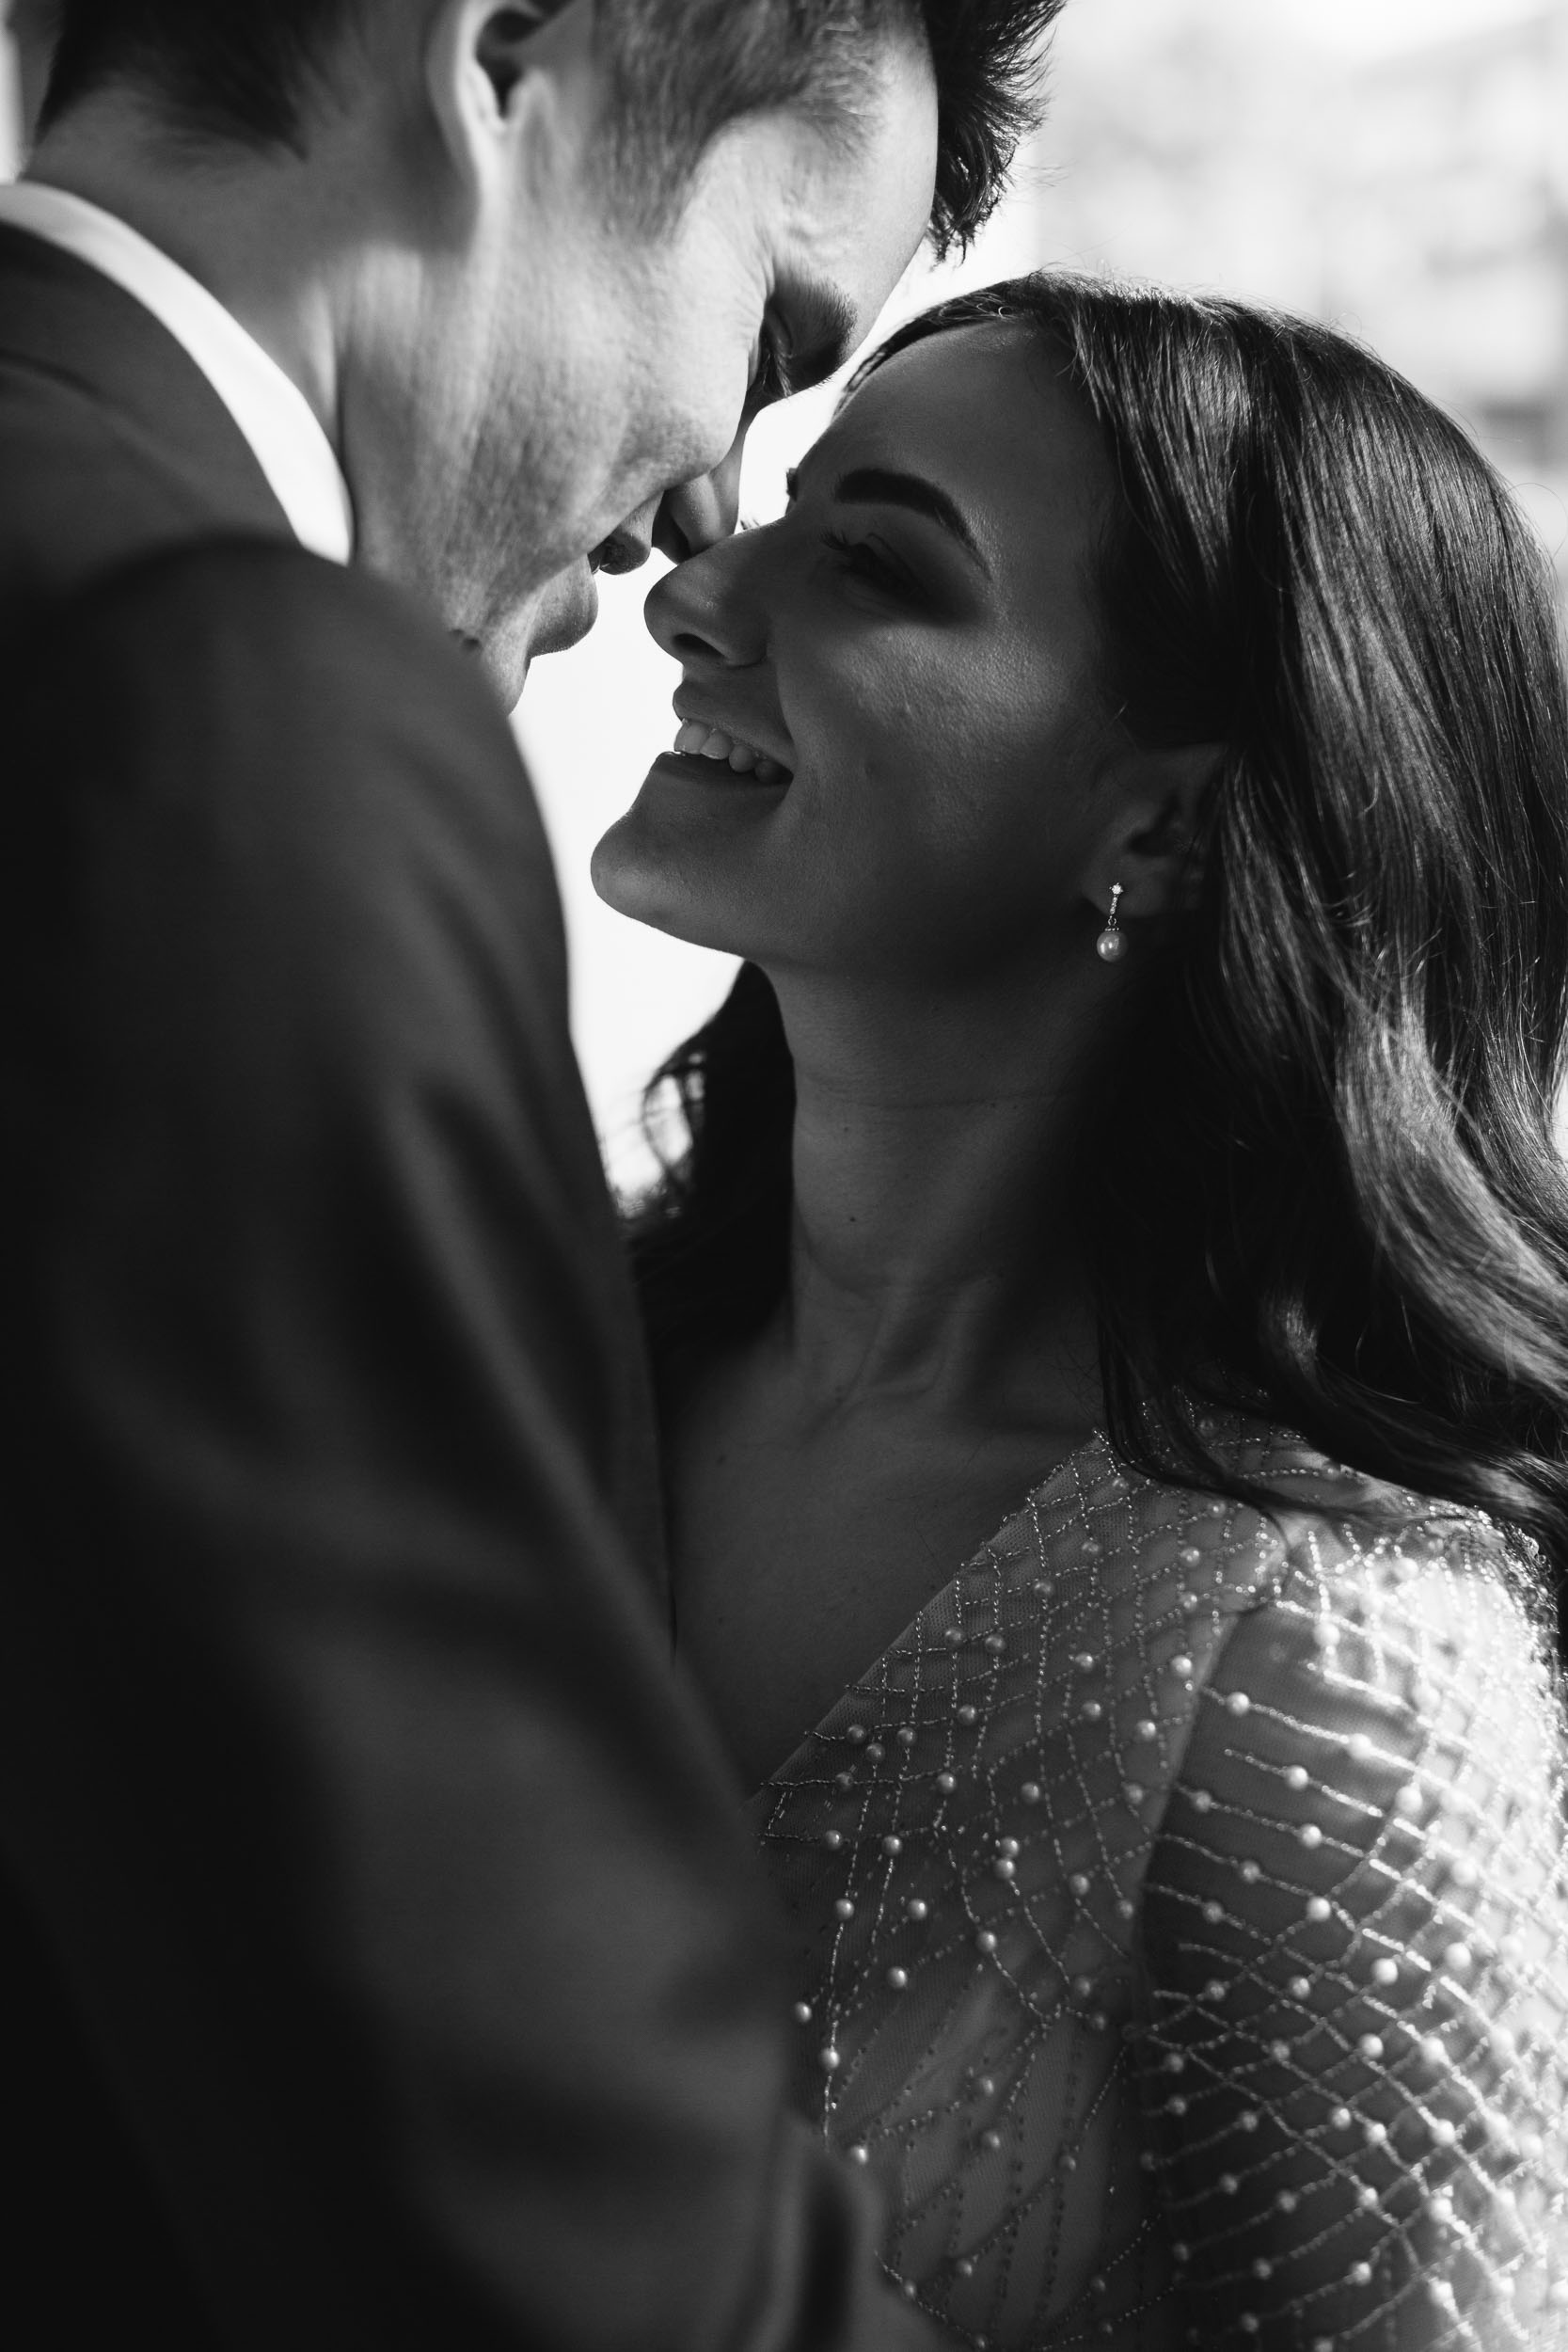 Kas-Richards-Wedding-Photographer-Melbourne-City-Wedding-Alto-Event-Space-Jane-Hill-Bridal-Gown-49.jpg